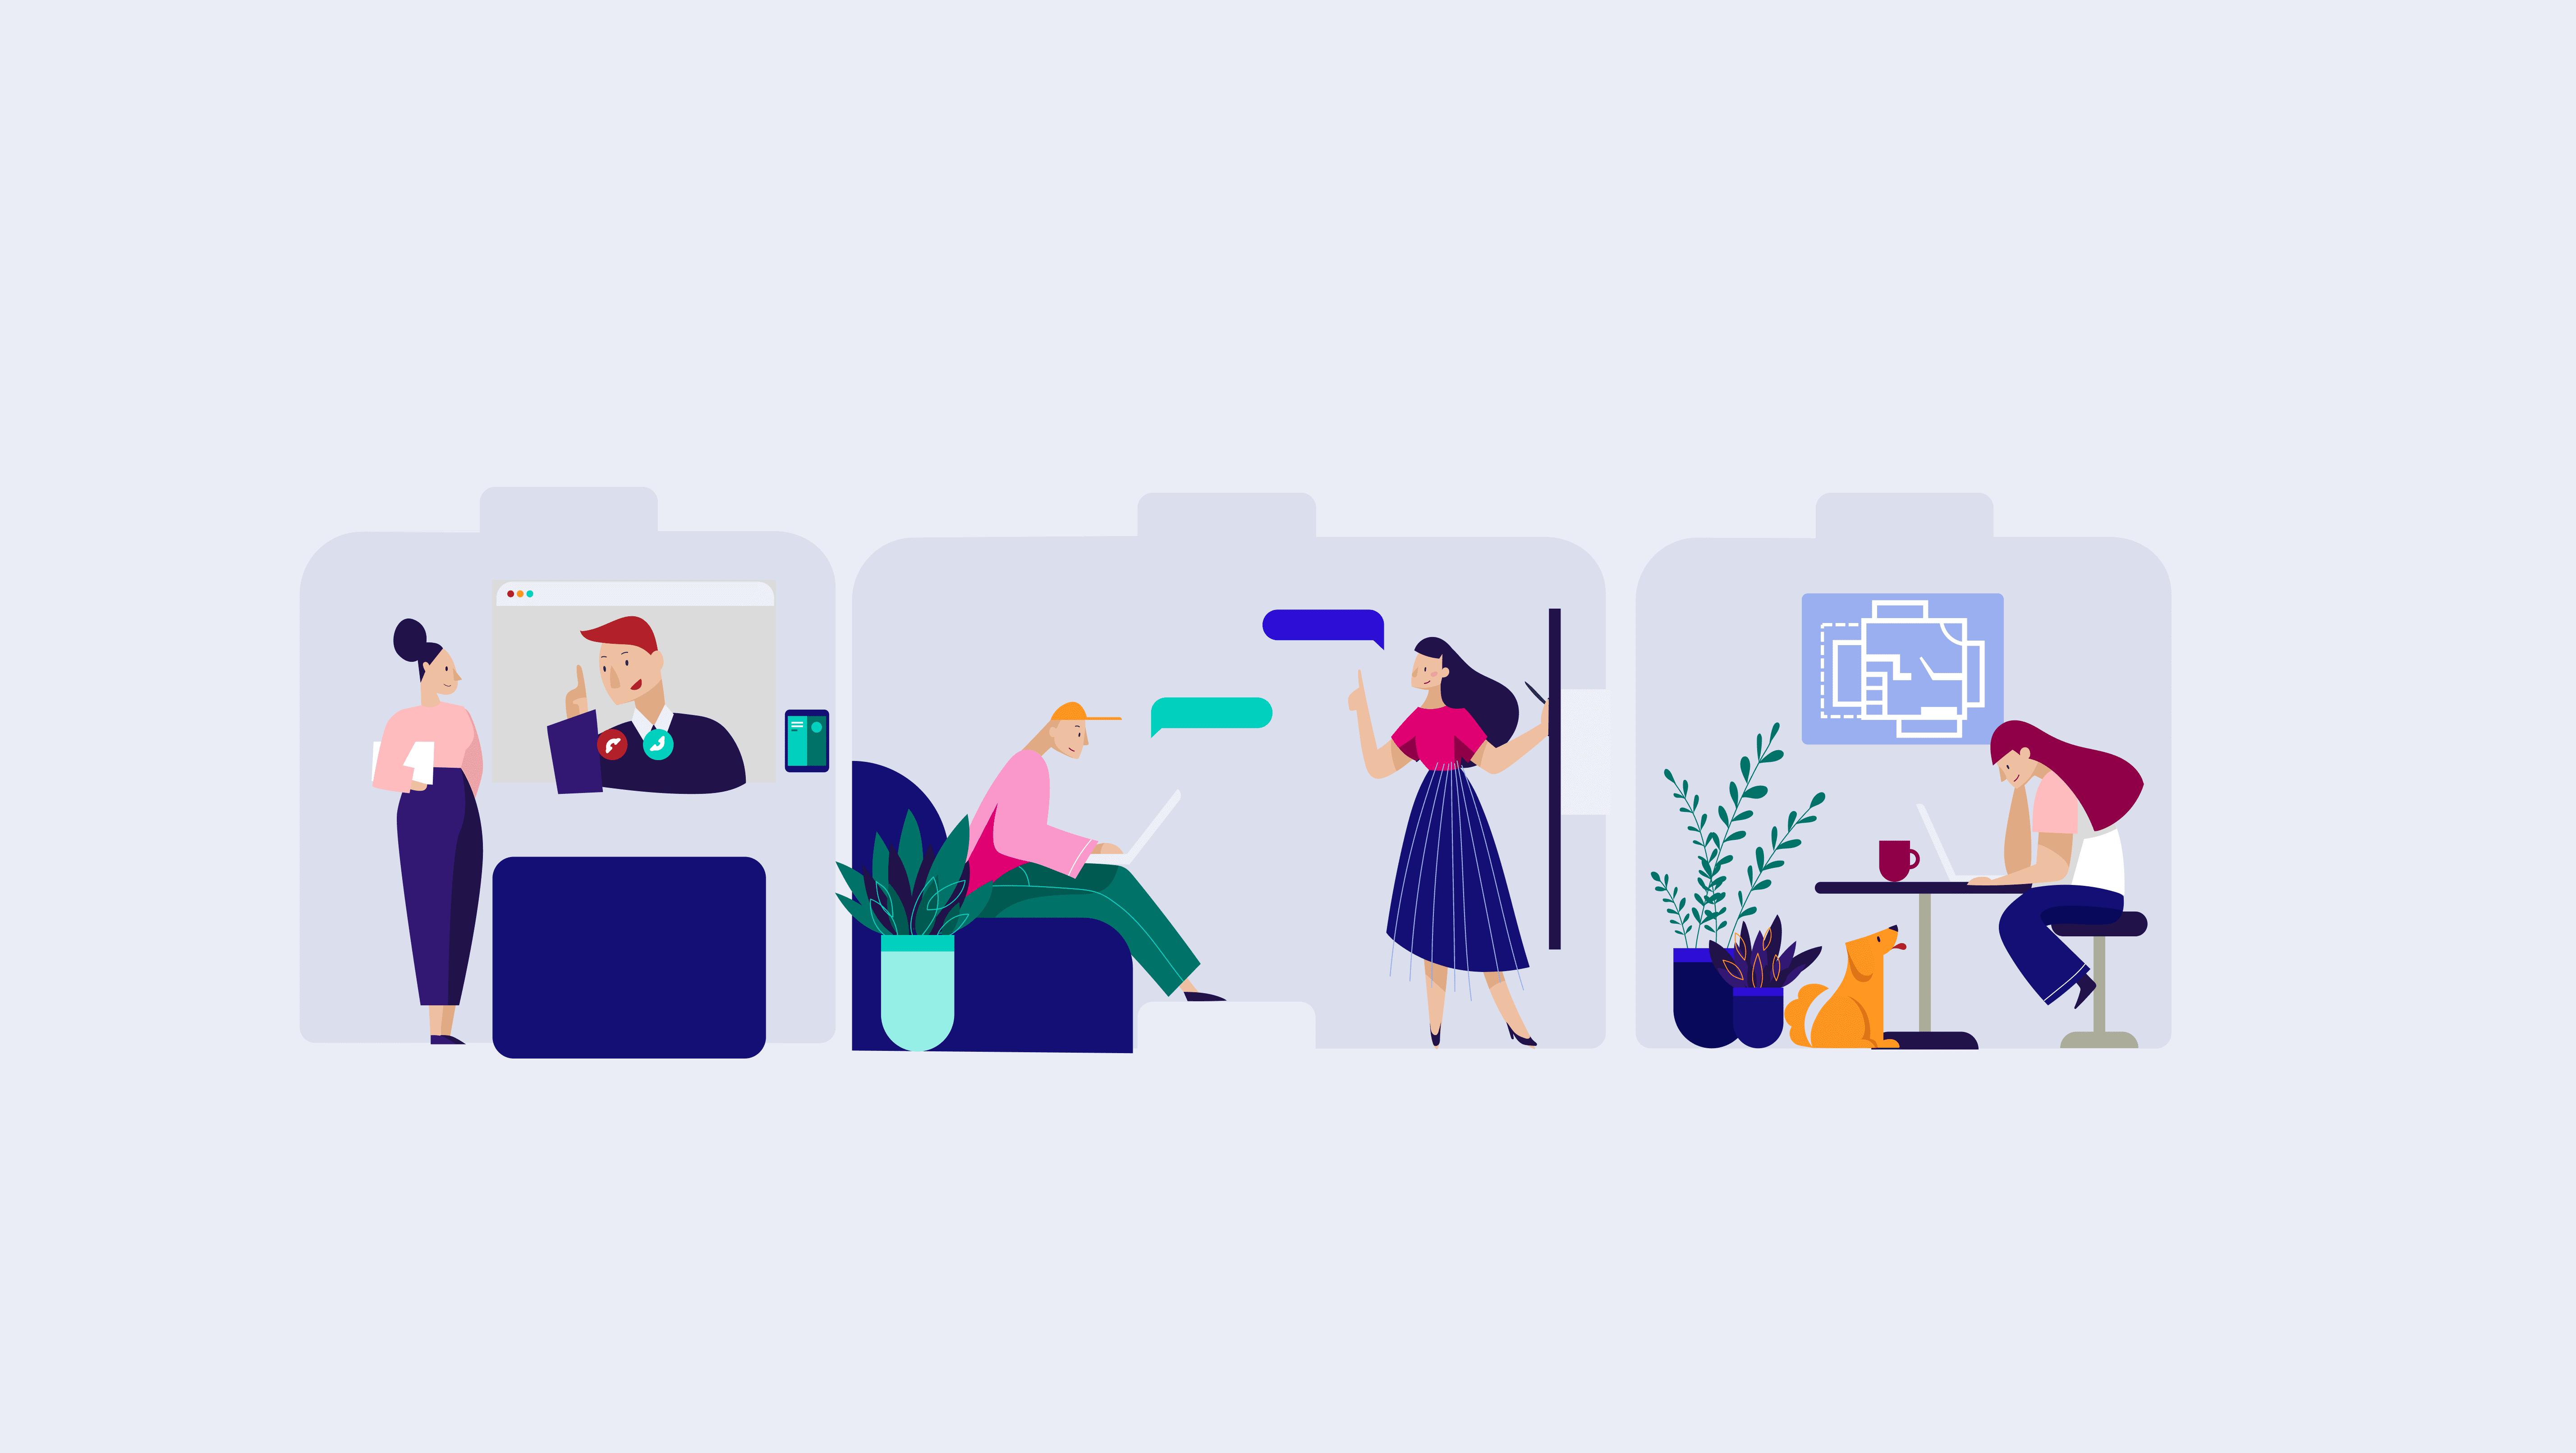 OffieRnD coworking software